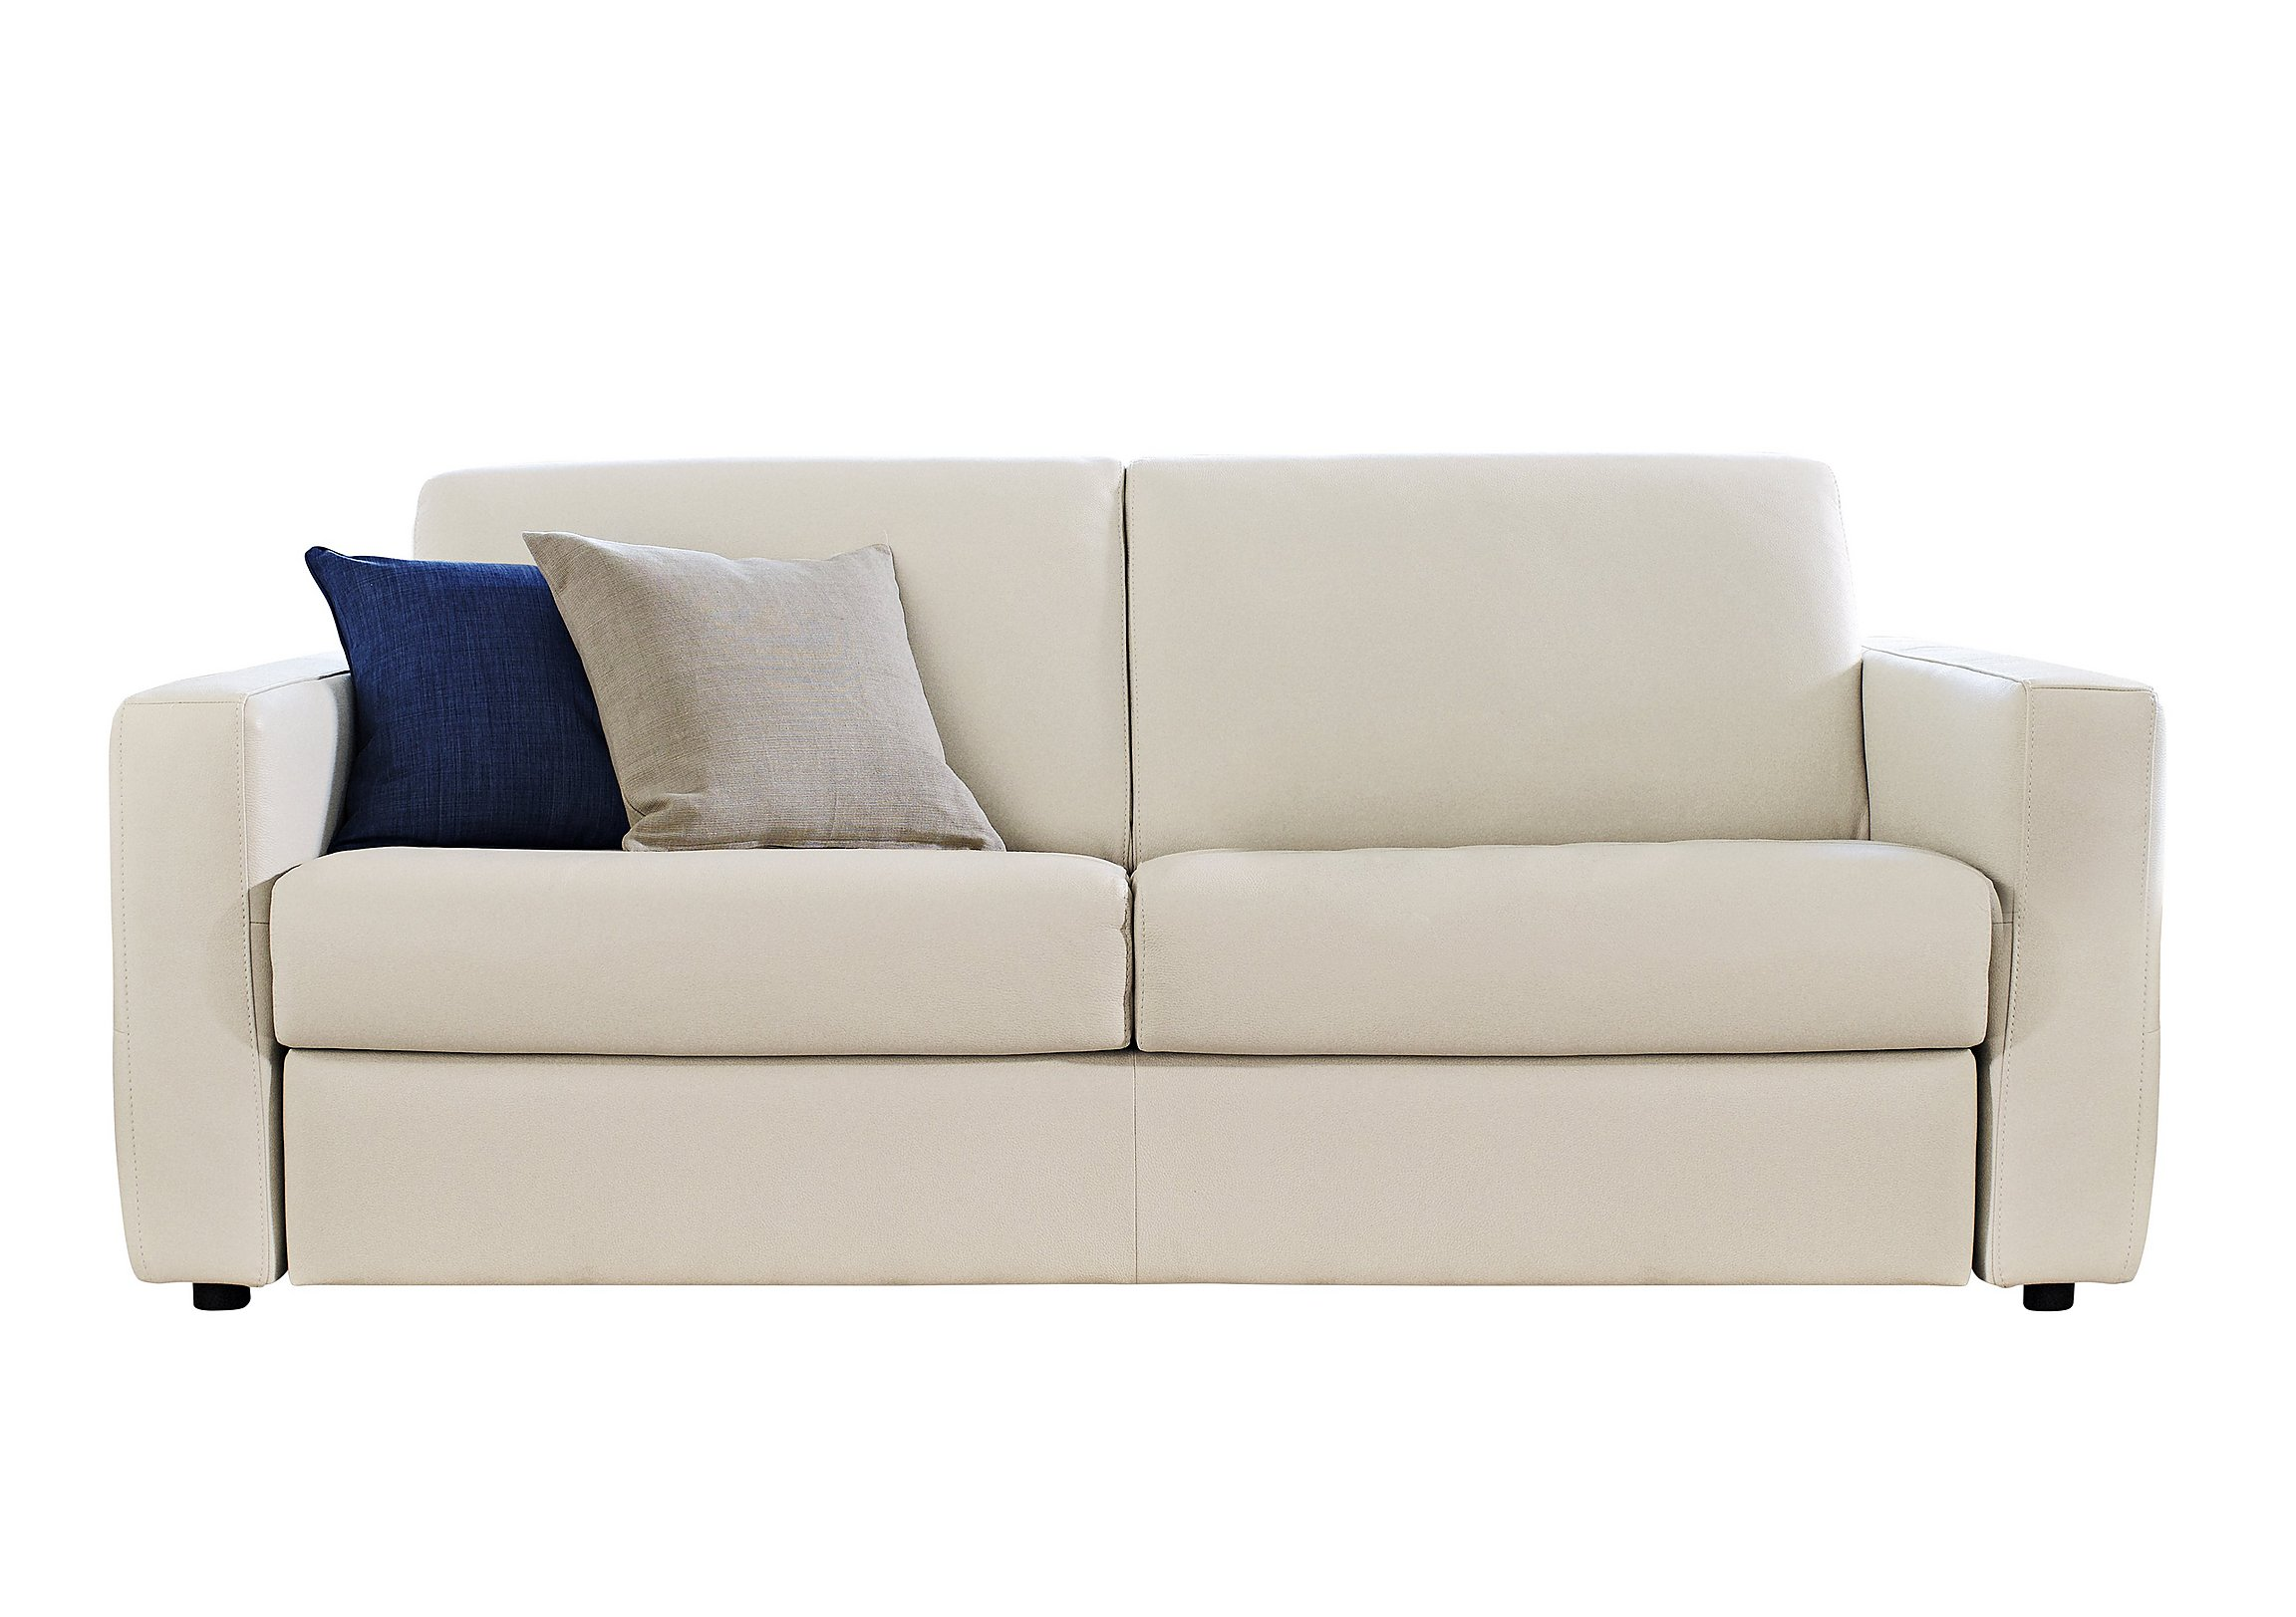 Natuzzi Bedroom Furniture Arona 2 Seater Leather Sofa Bed Natuzzi Editions Furniture Village